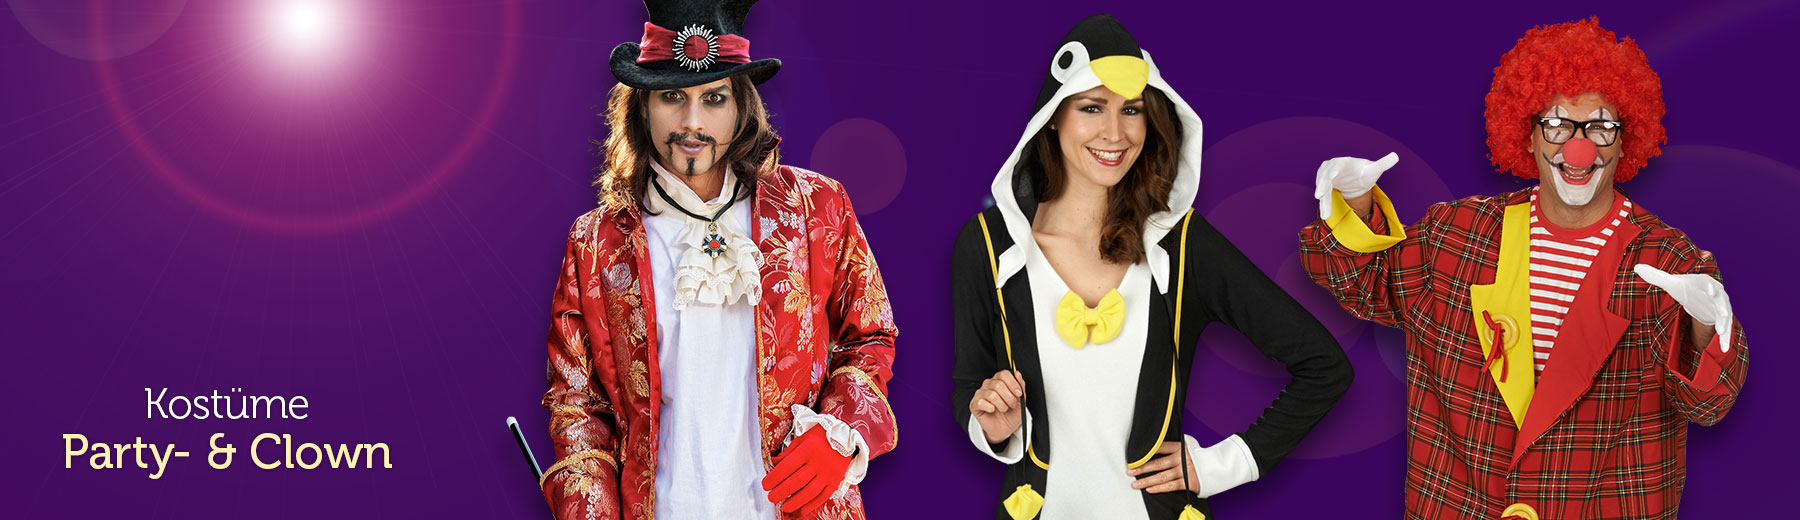 Party- & Clown Kostüme